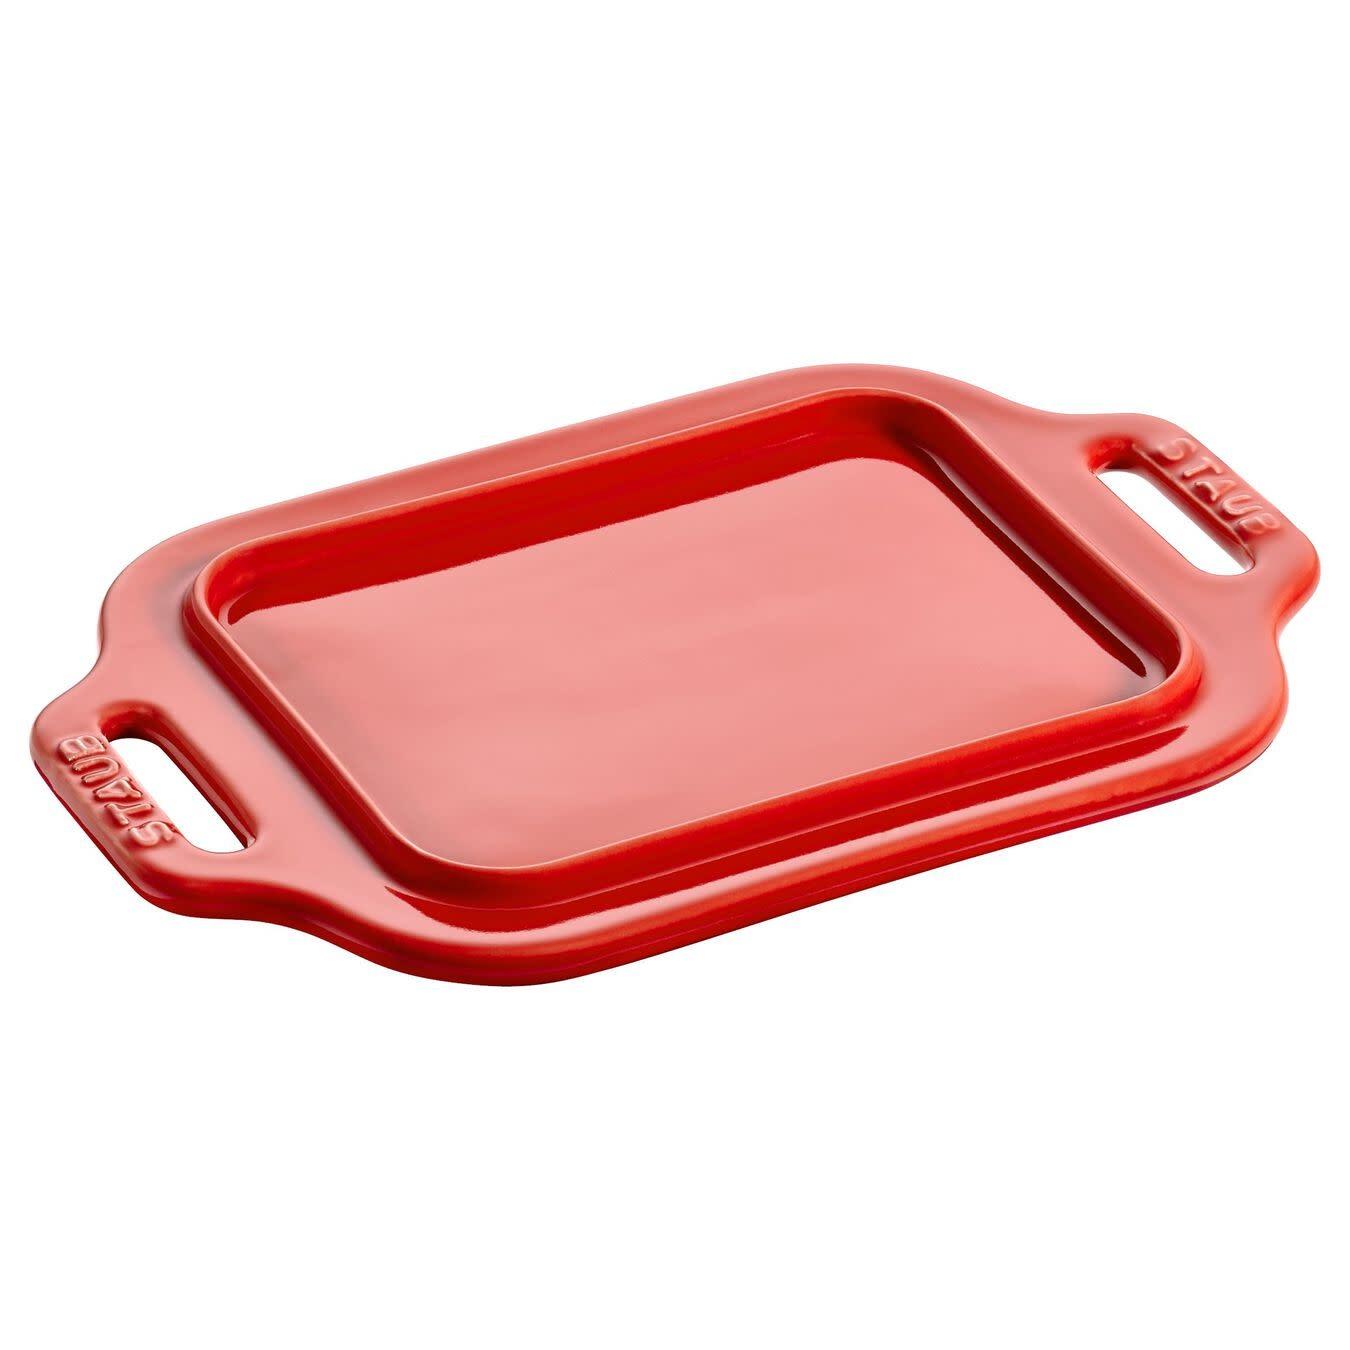 Staub Butter Dish Cherry Red